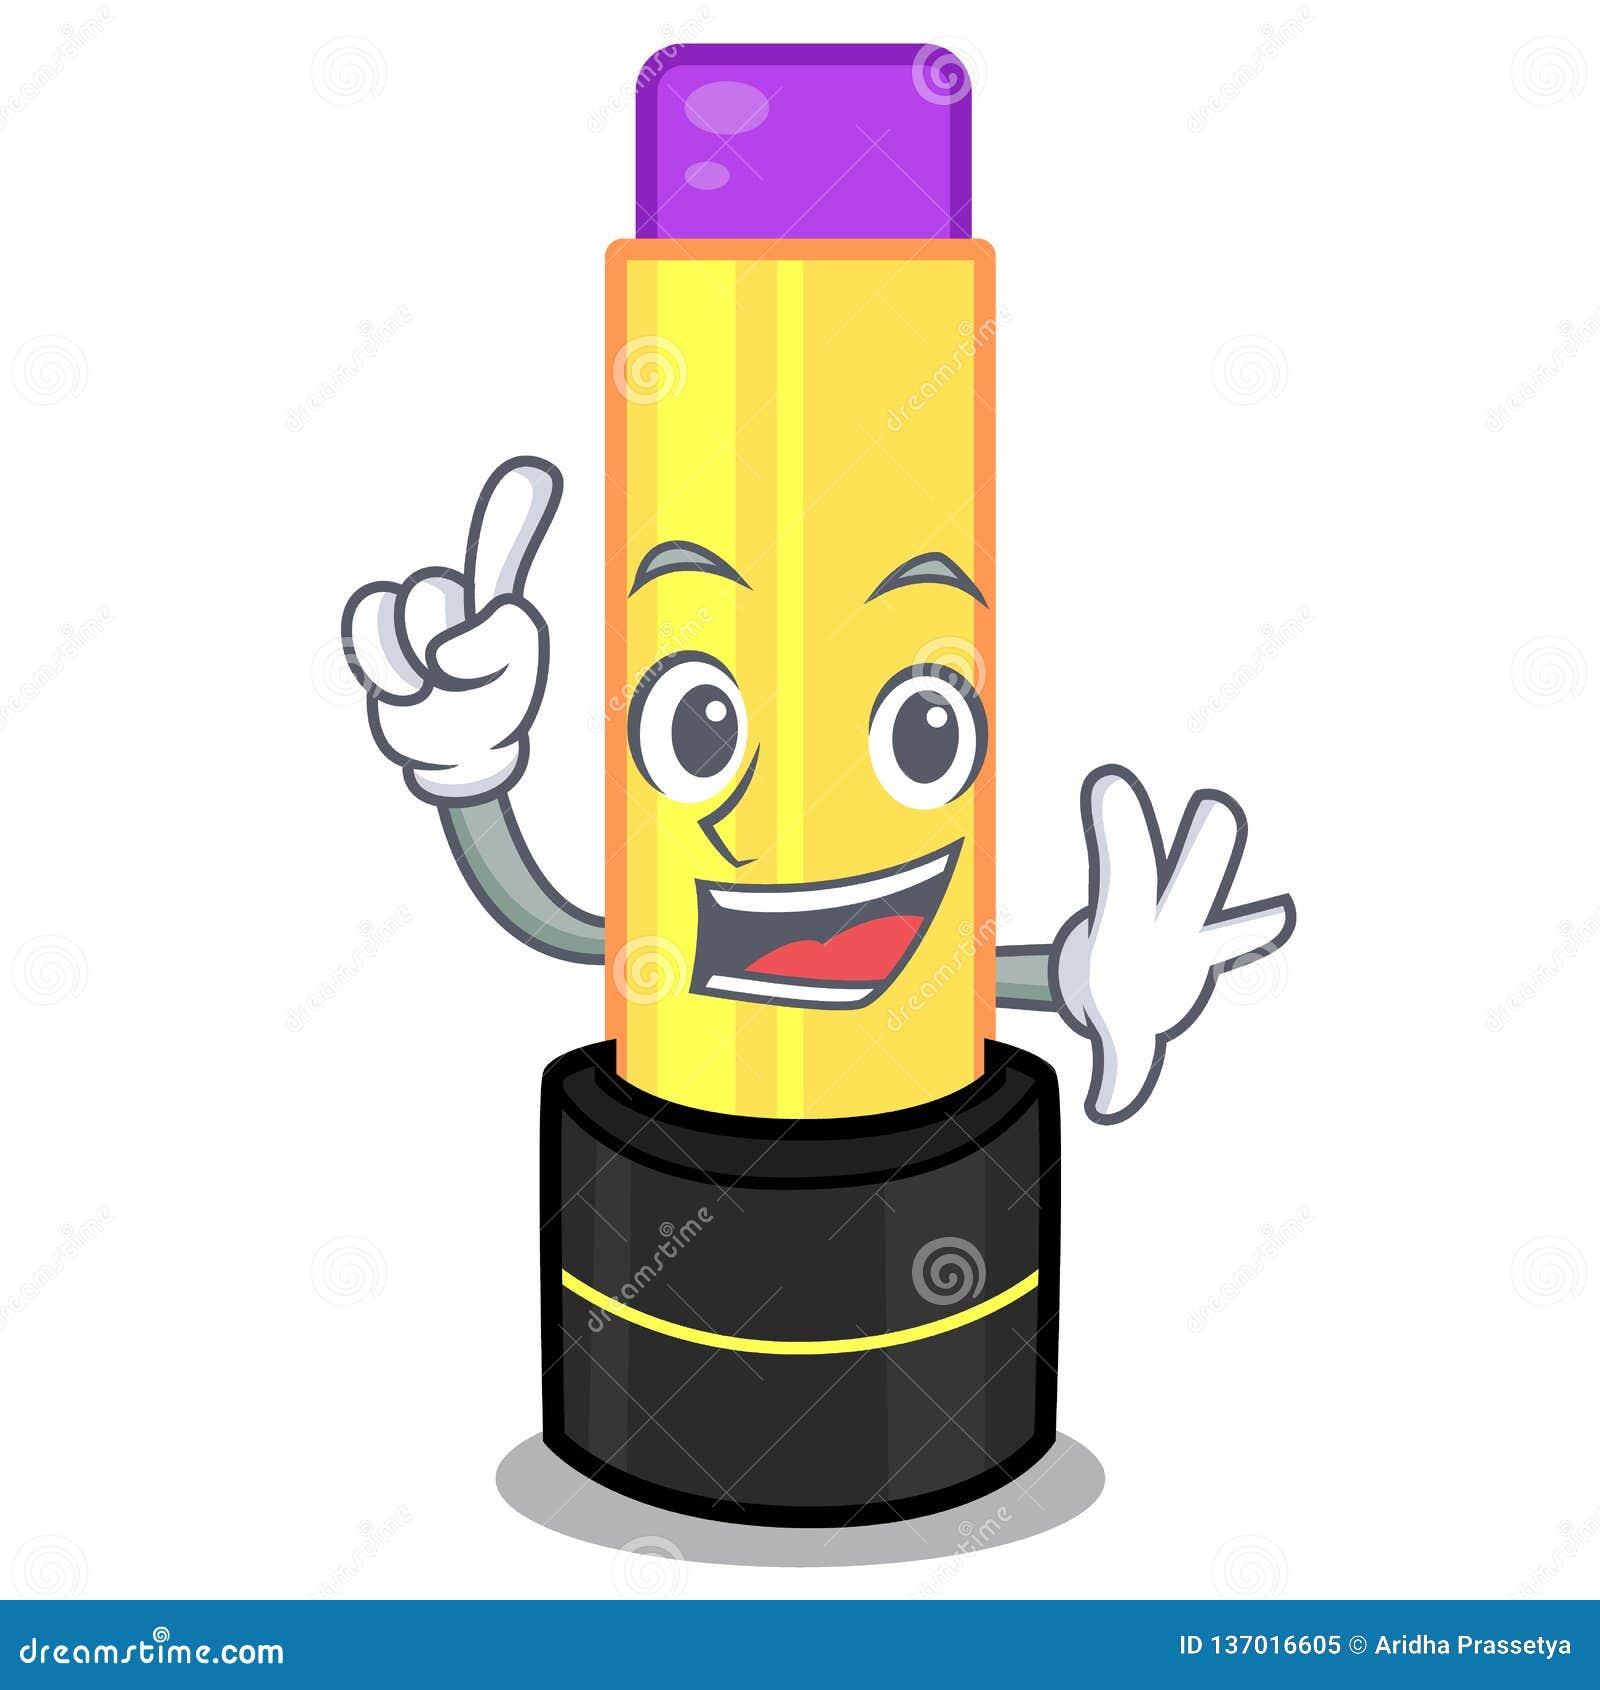 Finger lip balm in the cartoon shape